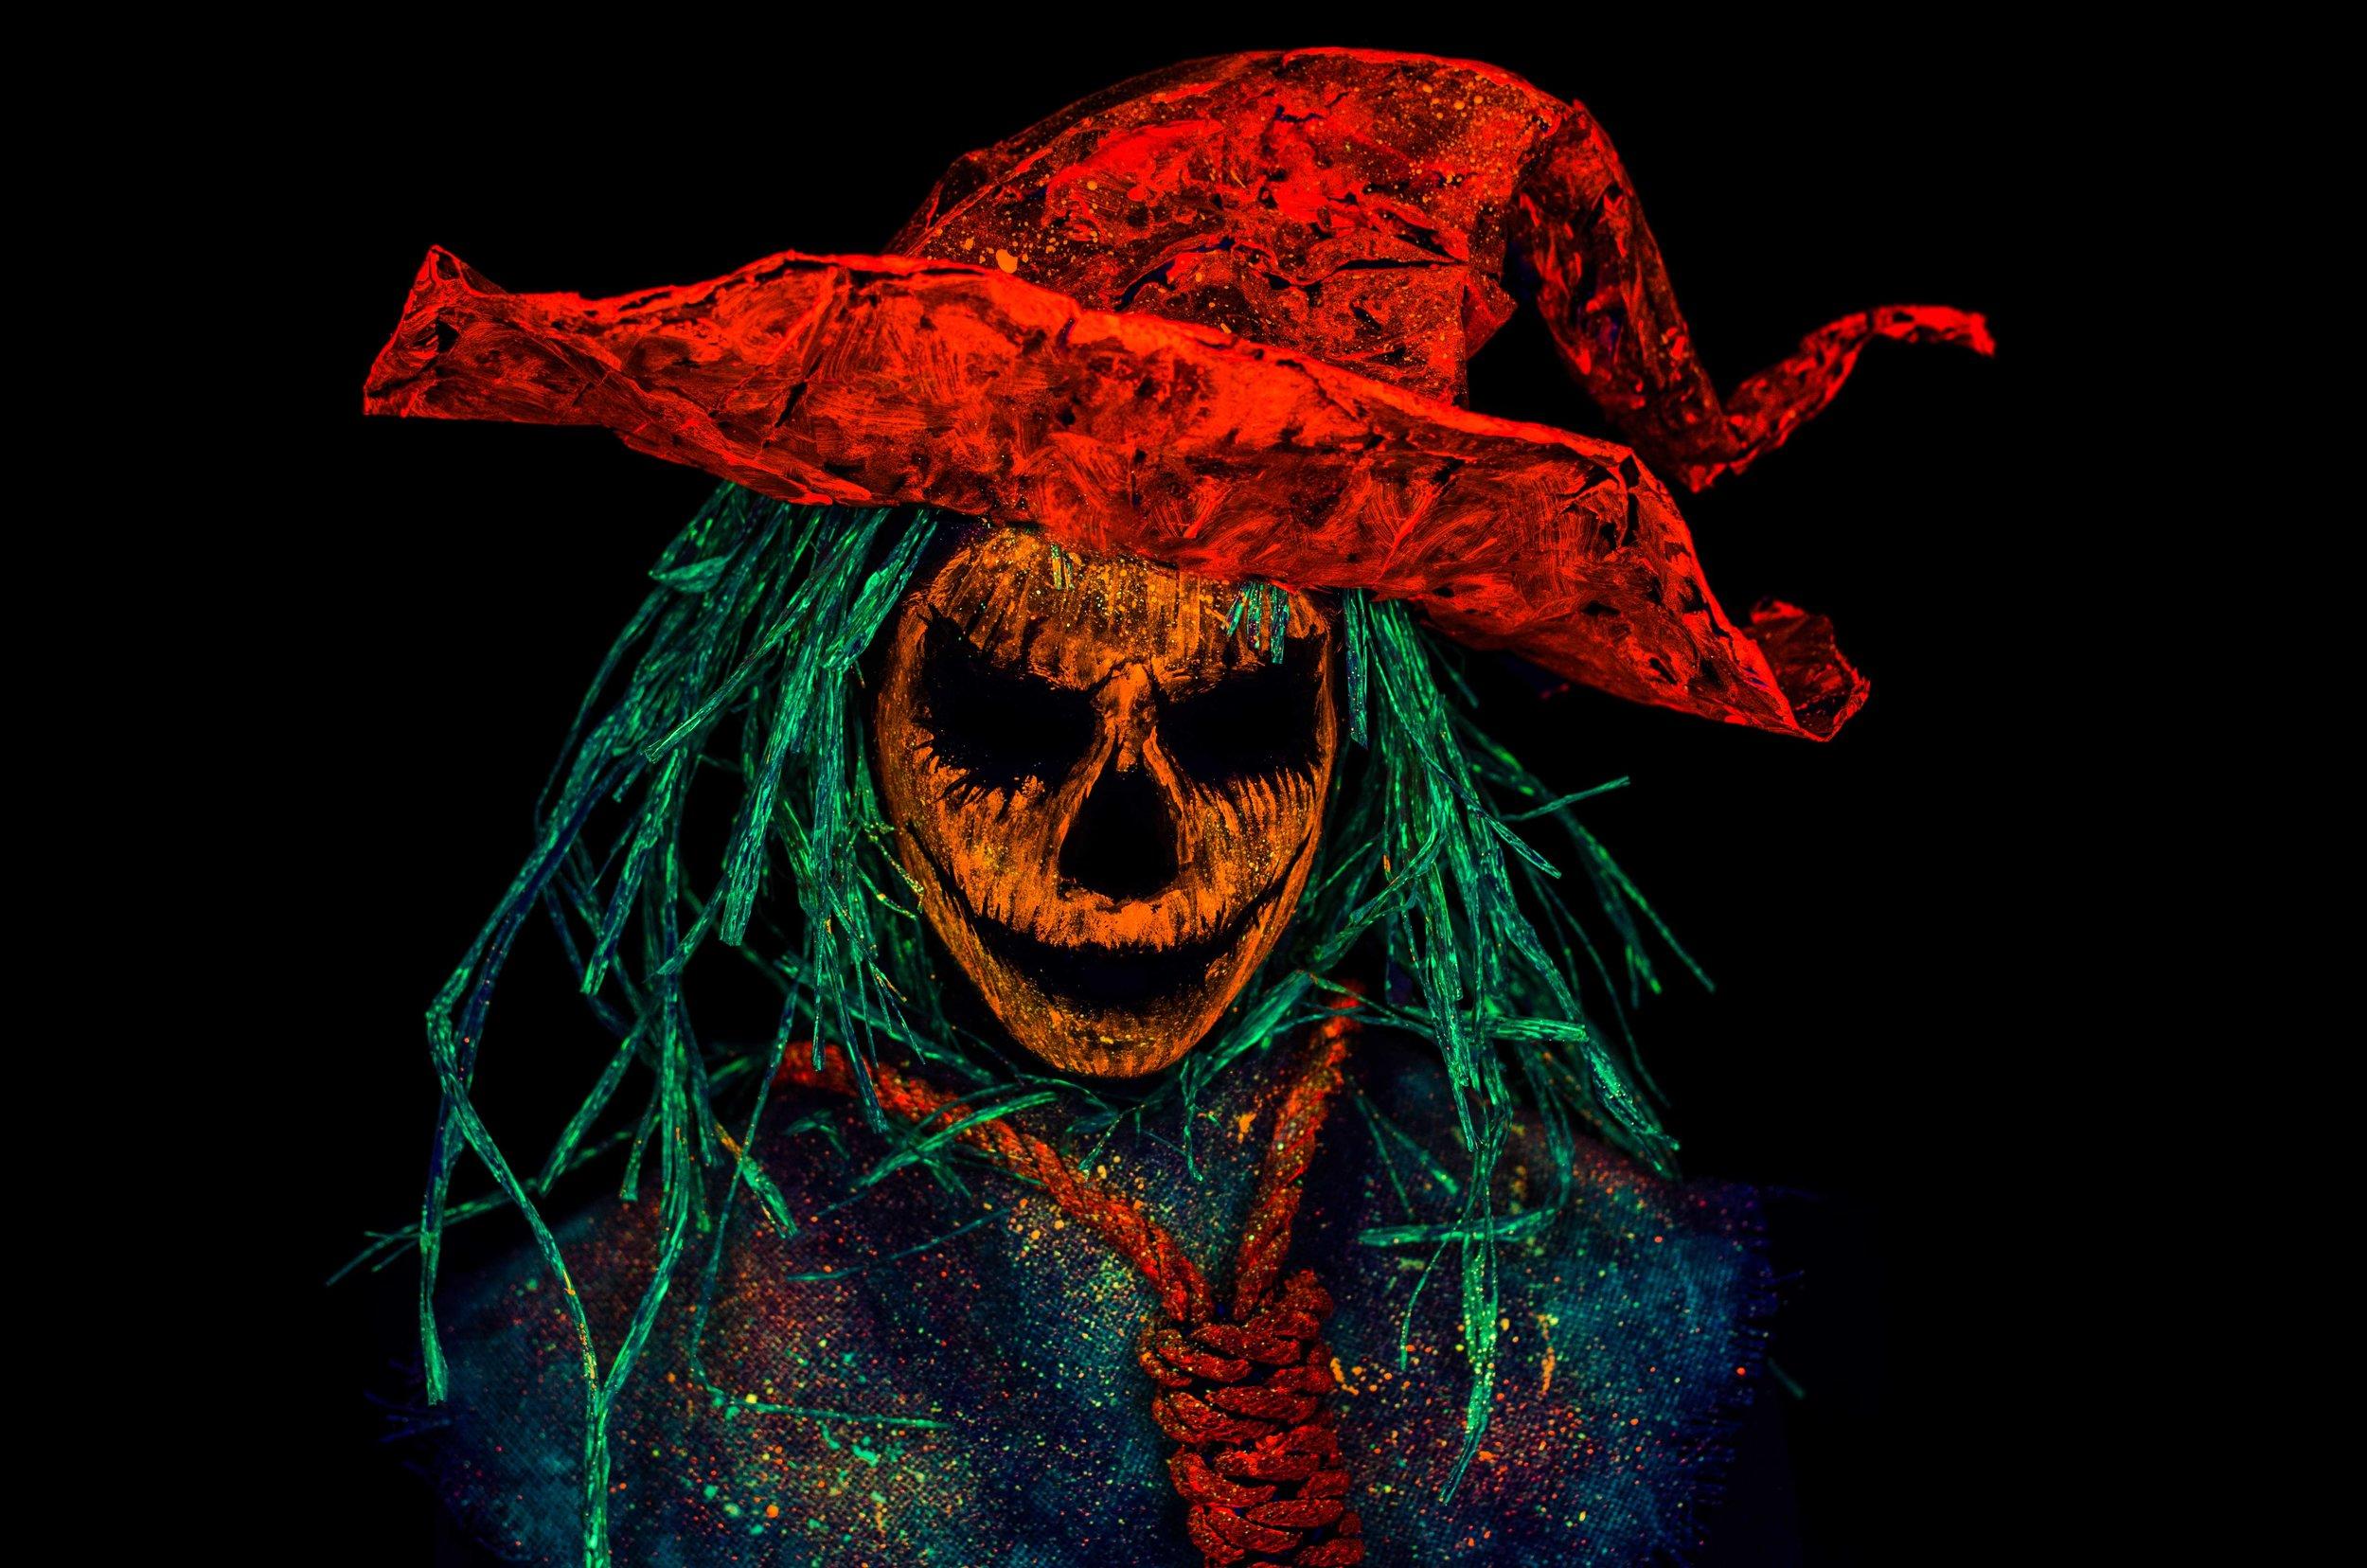 Black Light Halloween Scarecrow